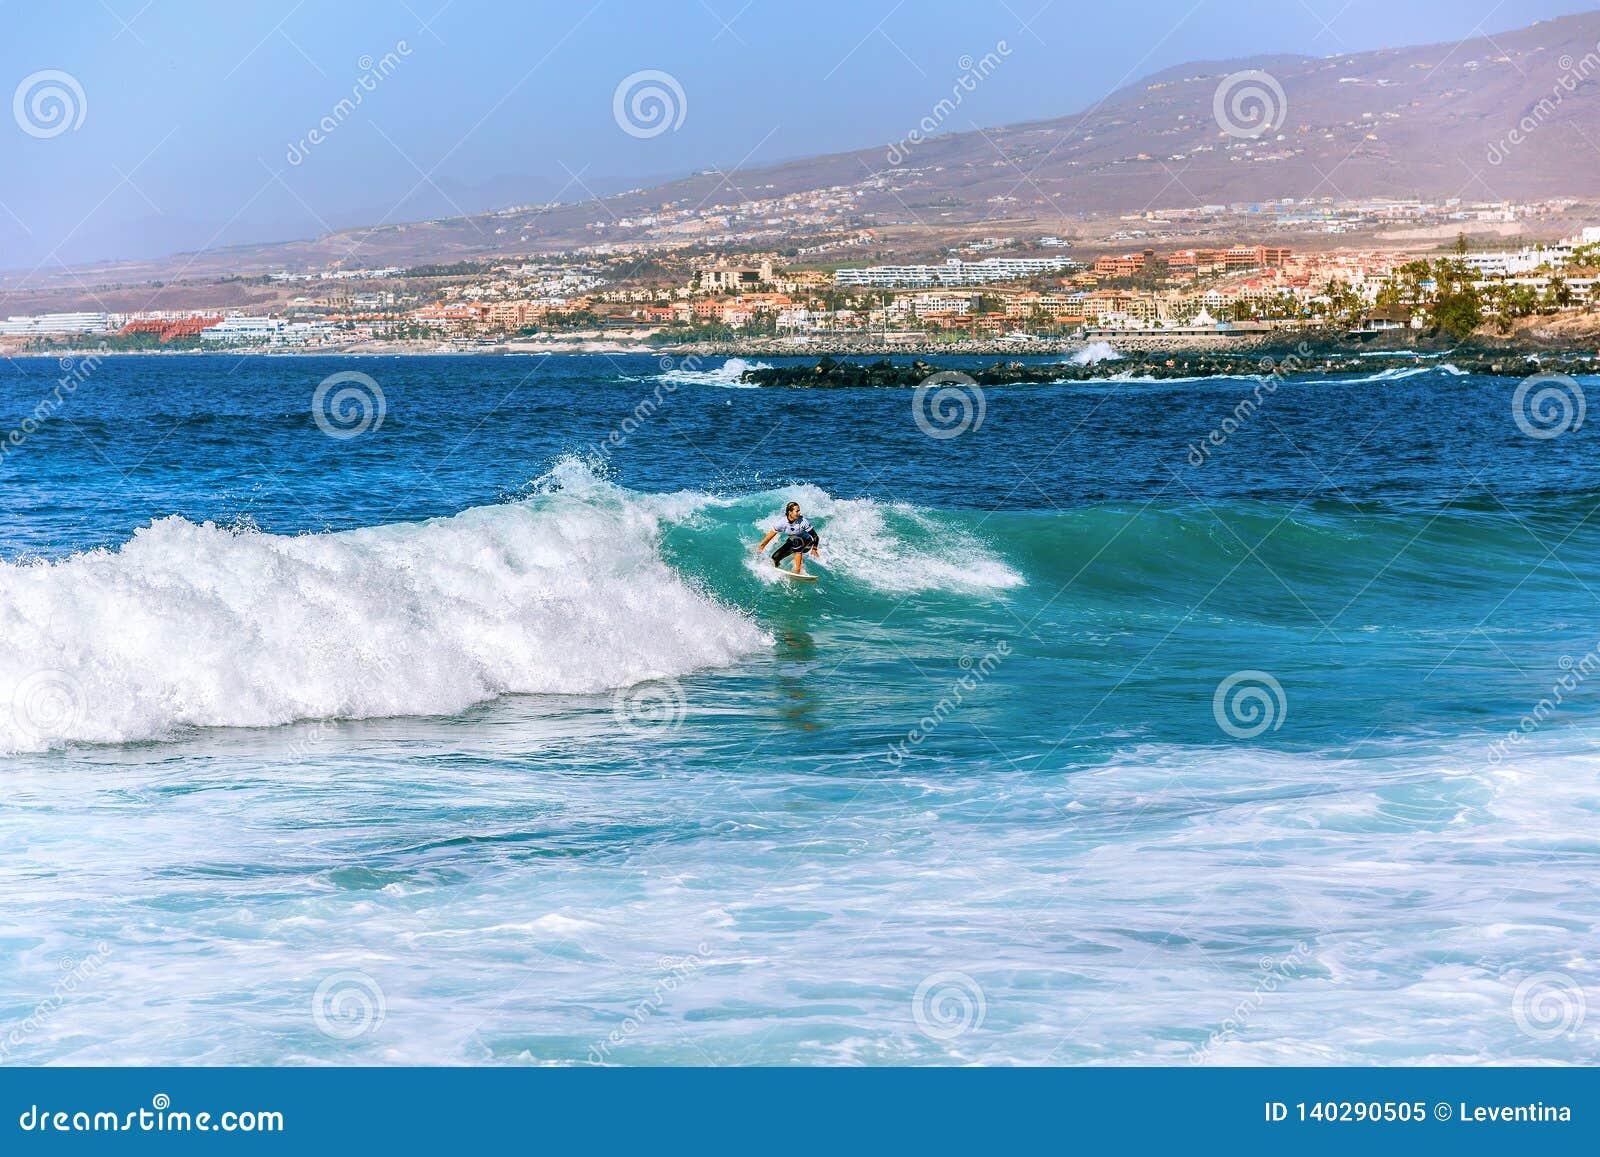 Menina do surfista em Costa Adeje em Tenerife